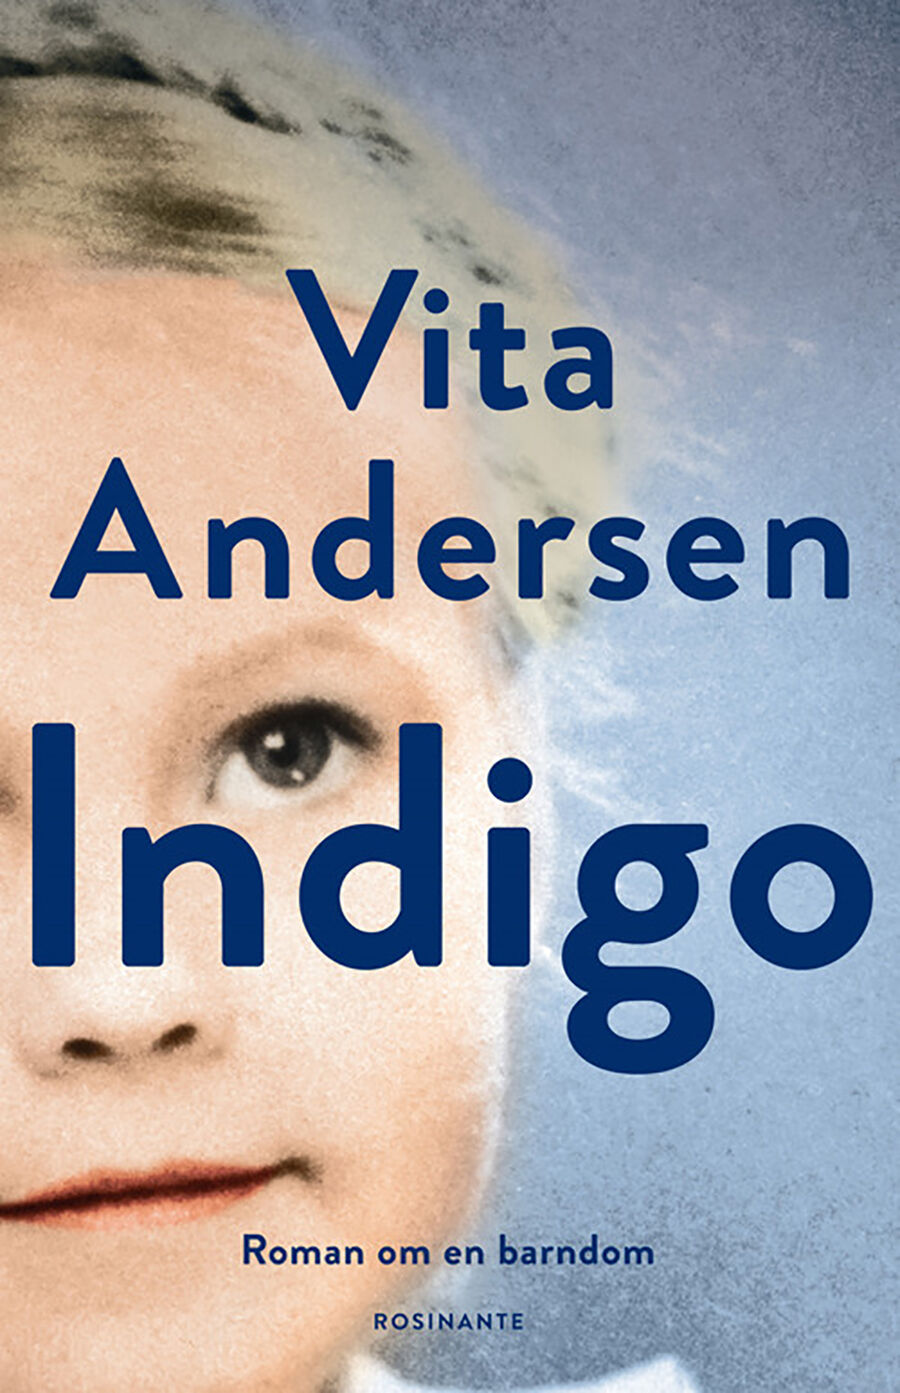 In memoriam: Vita Andersen er død 78 år gammel